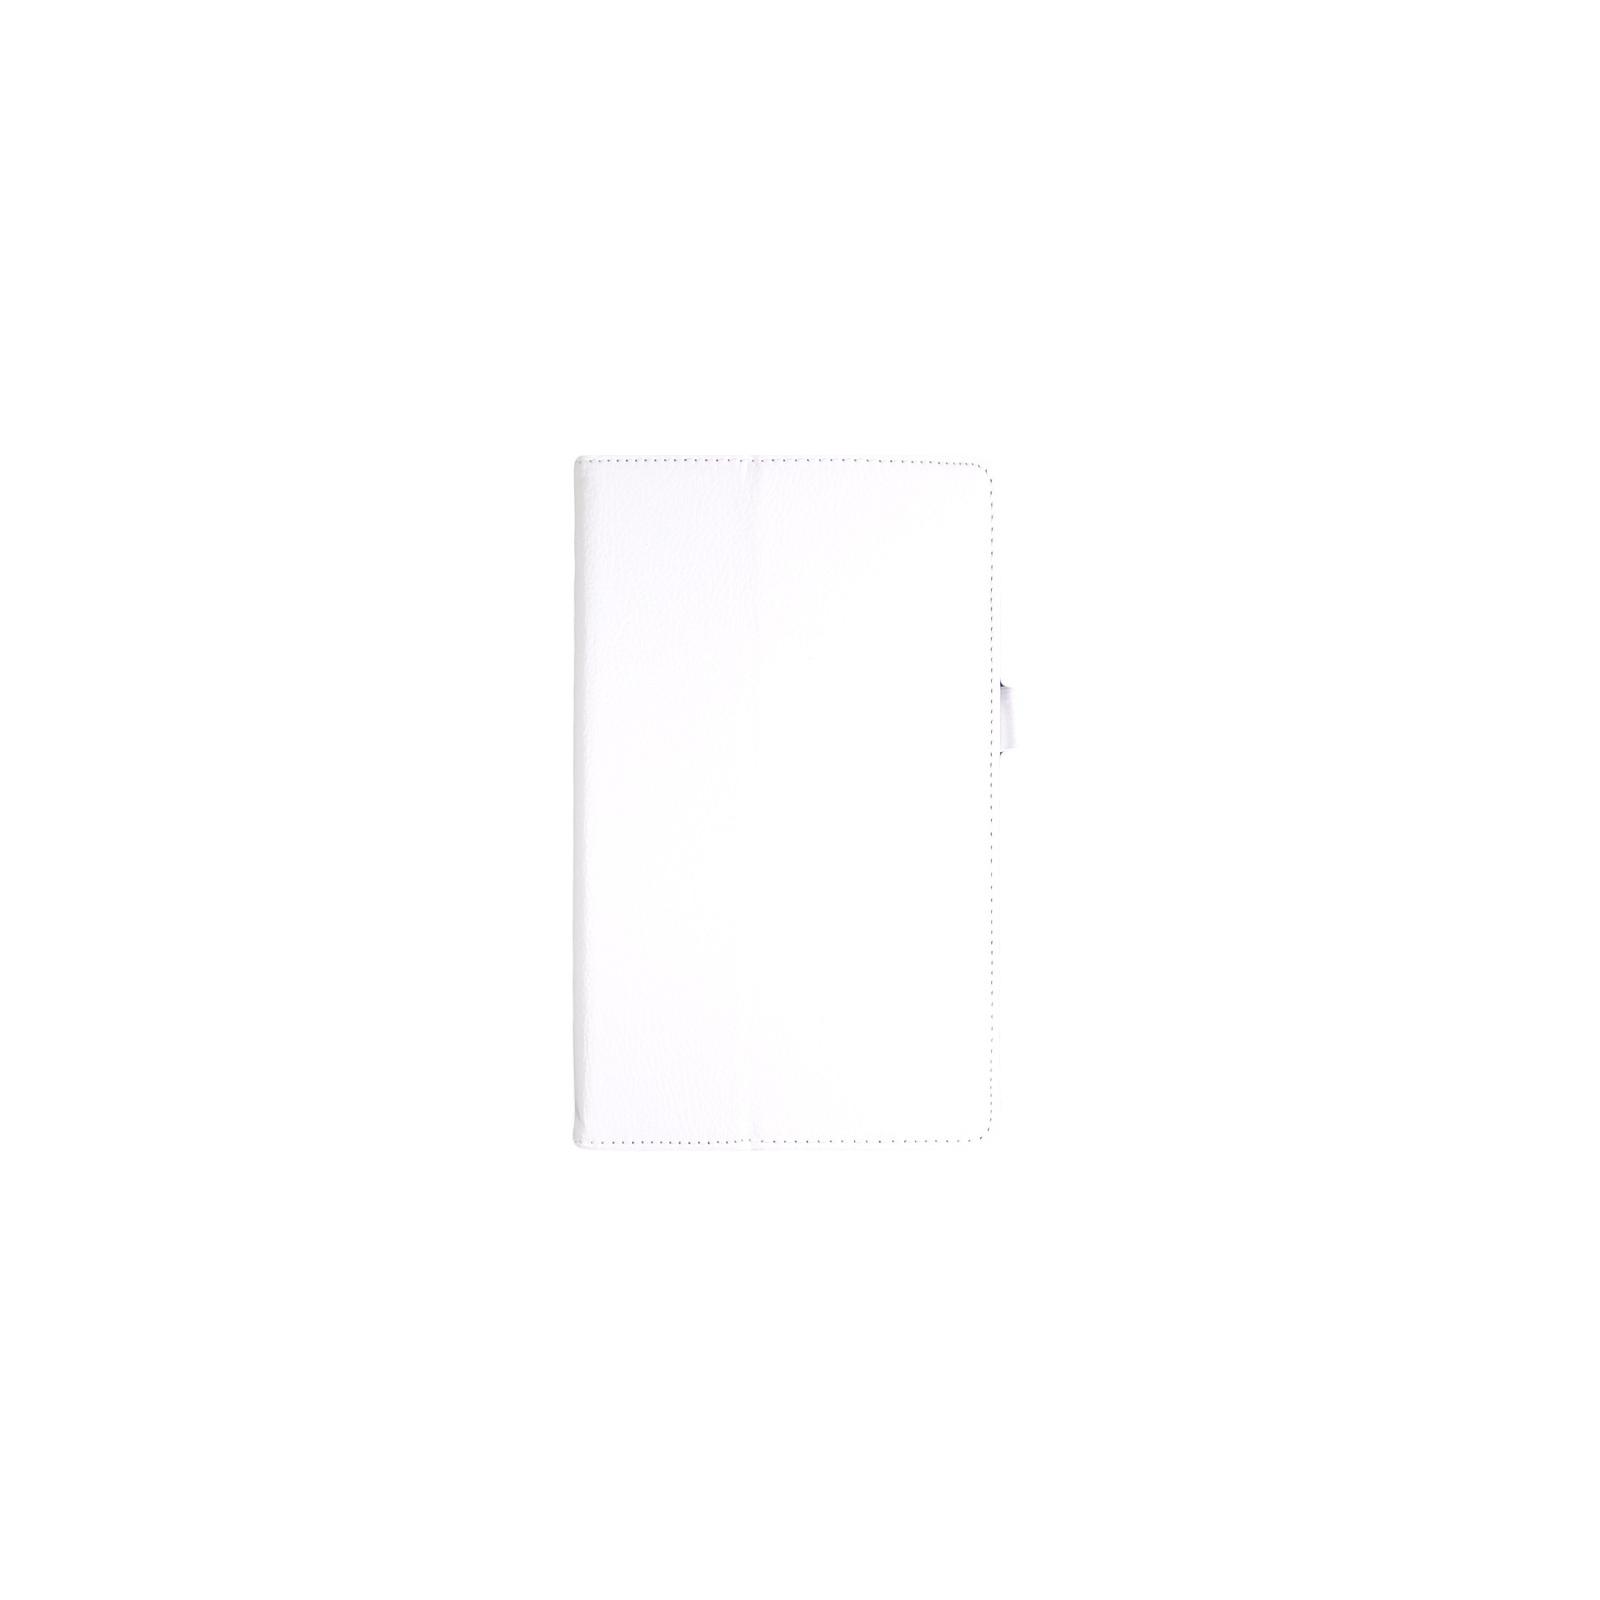 "Чехол для планшета Pro-case 8,4"" SM-T700 Galaxy Tab S 8.4 wite (SM-T700w)"